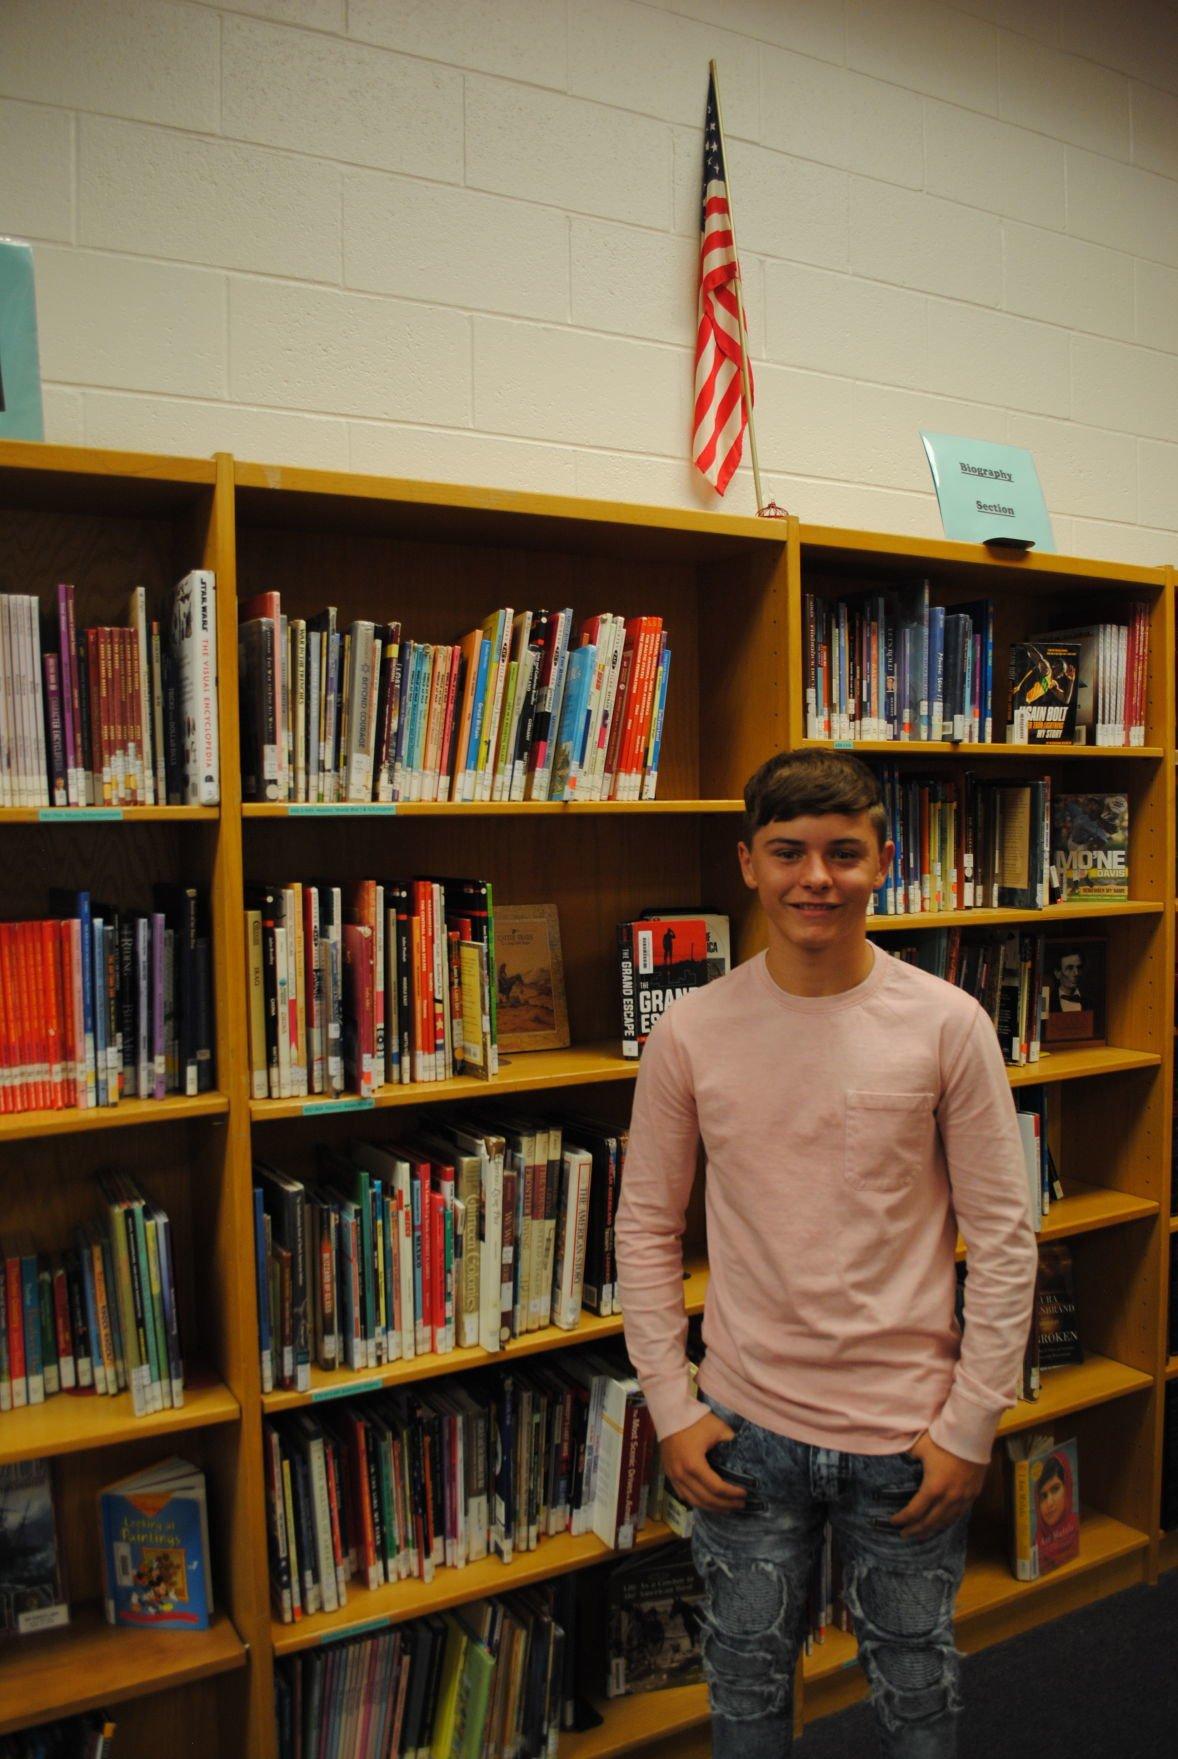 Elgin Middle School eight grader Levi Billings